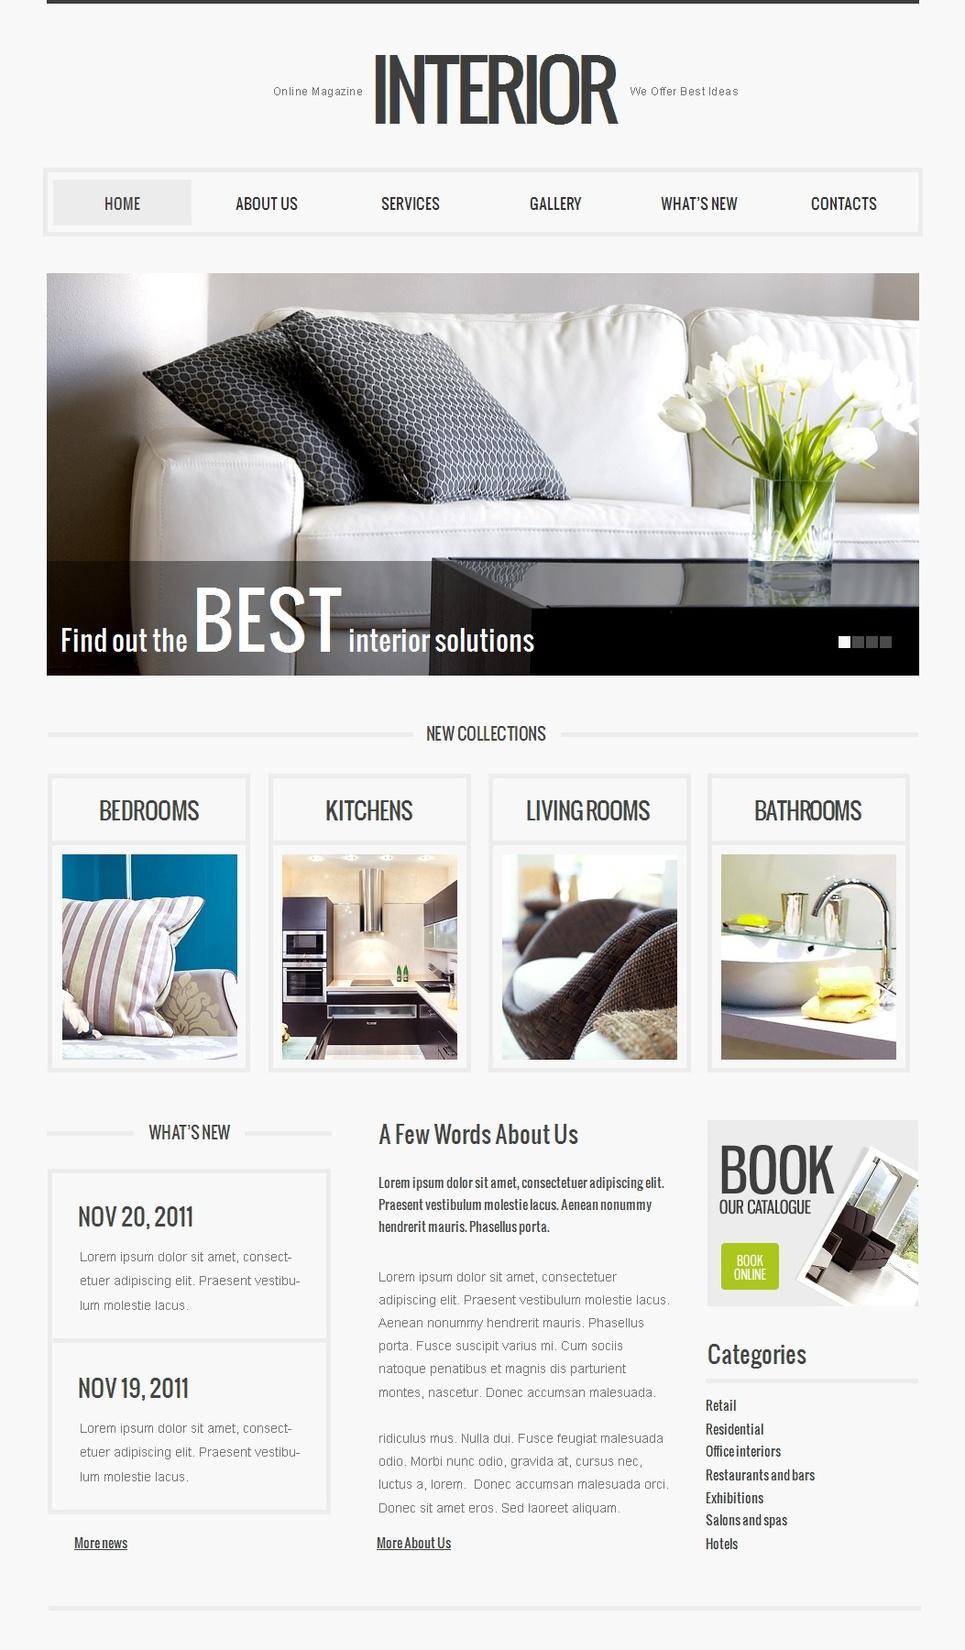 Online Interior Magazine Website Template - image